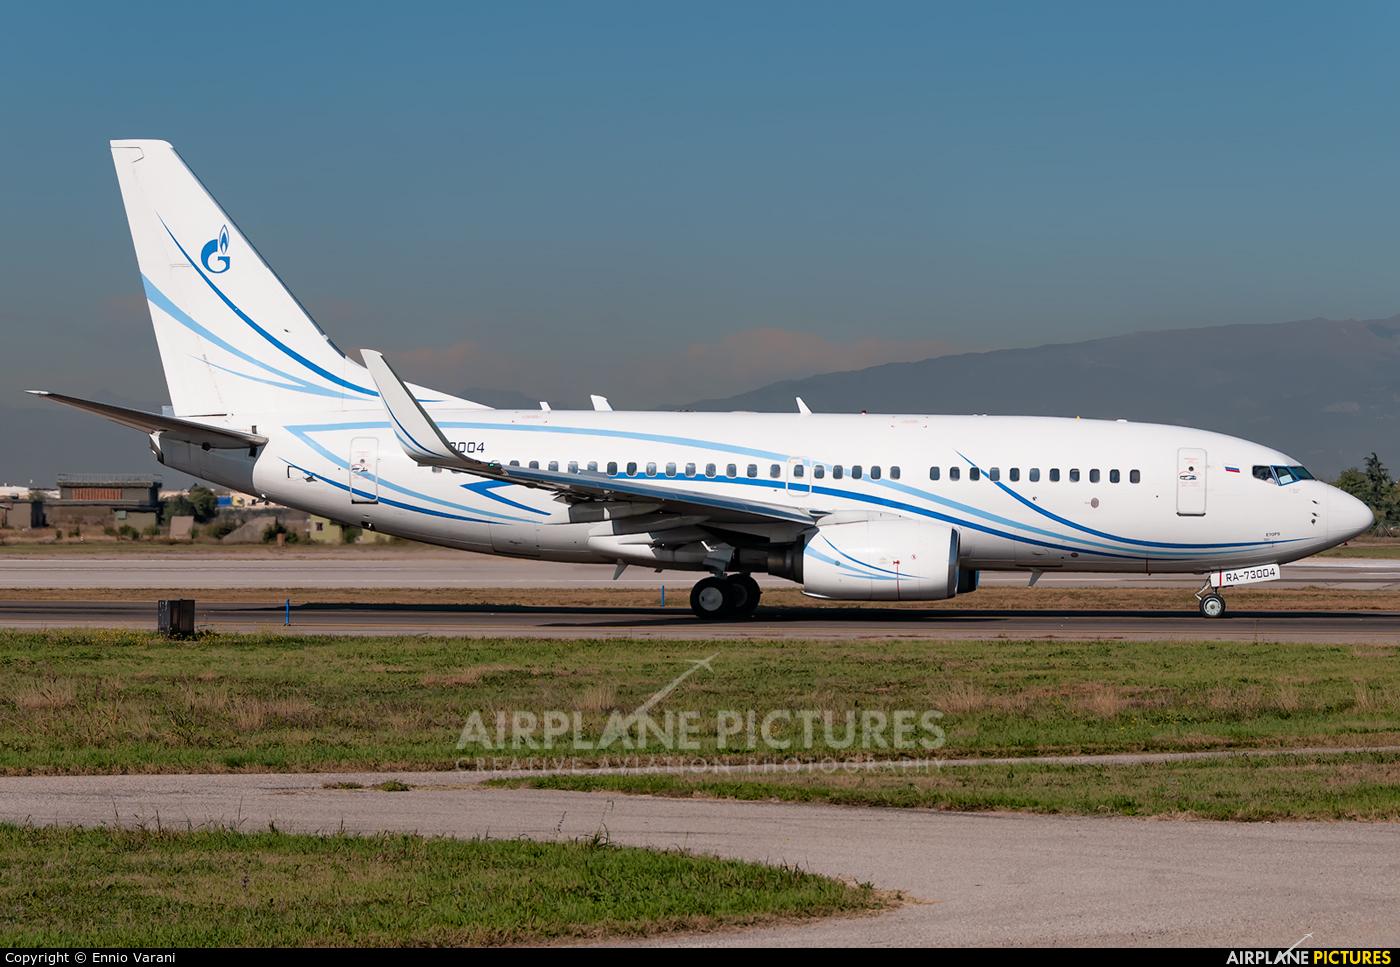 Gazpromavia RA-73004 aircraft at Verona - Villafranca